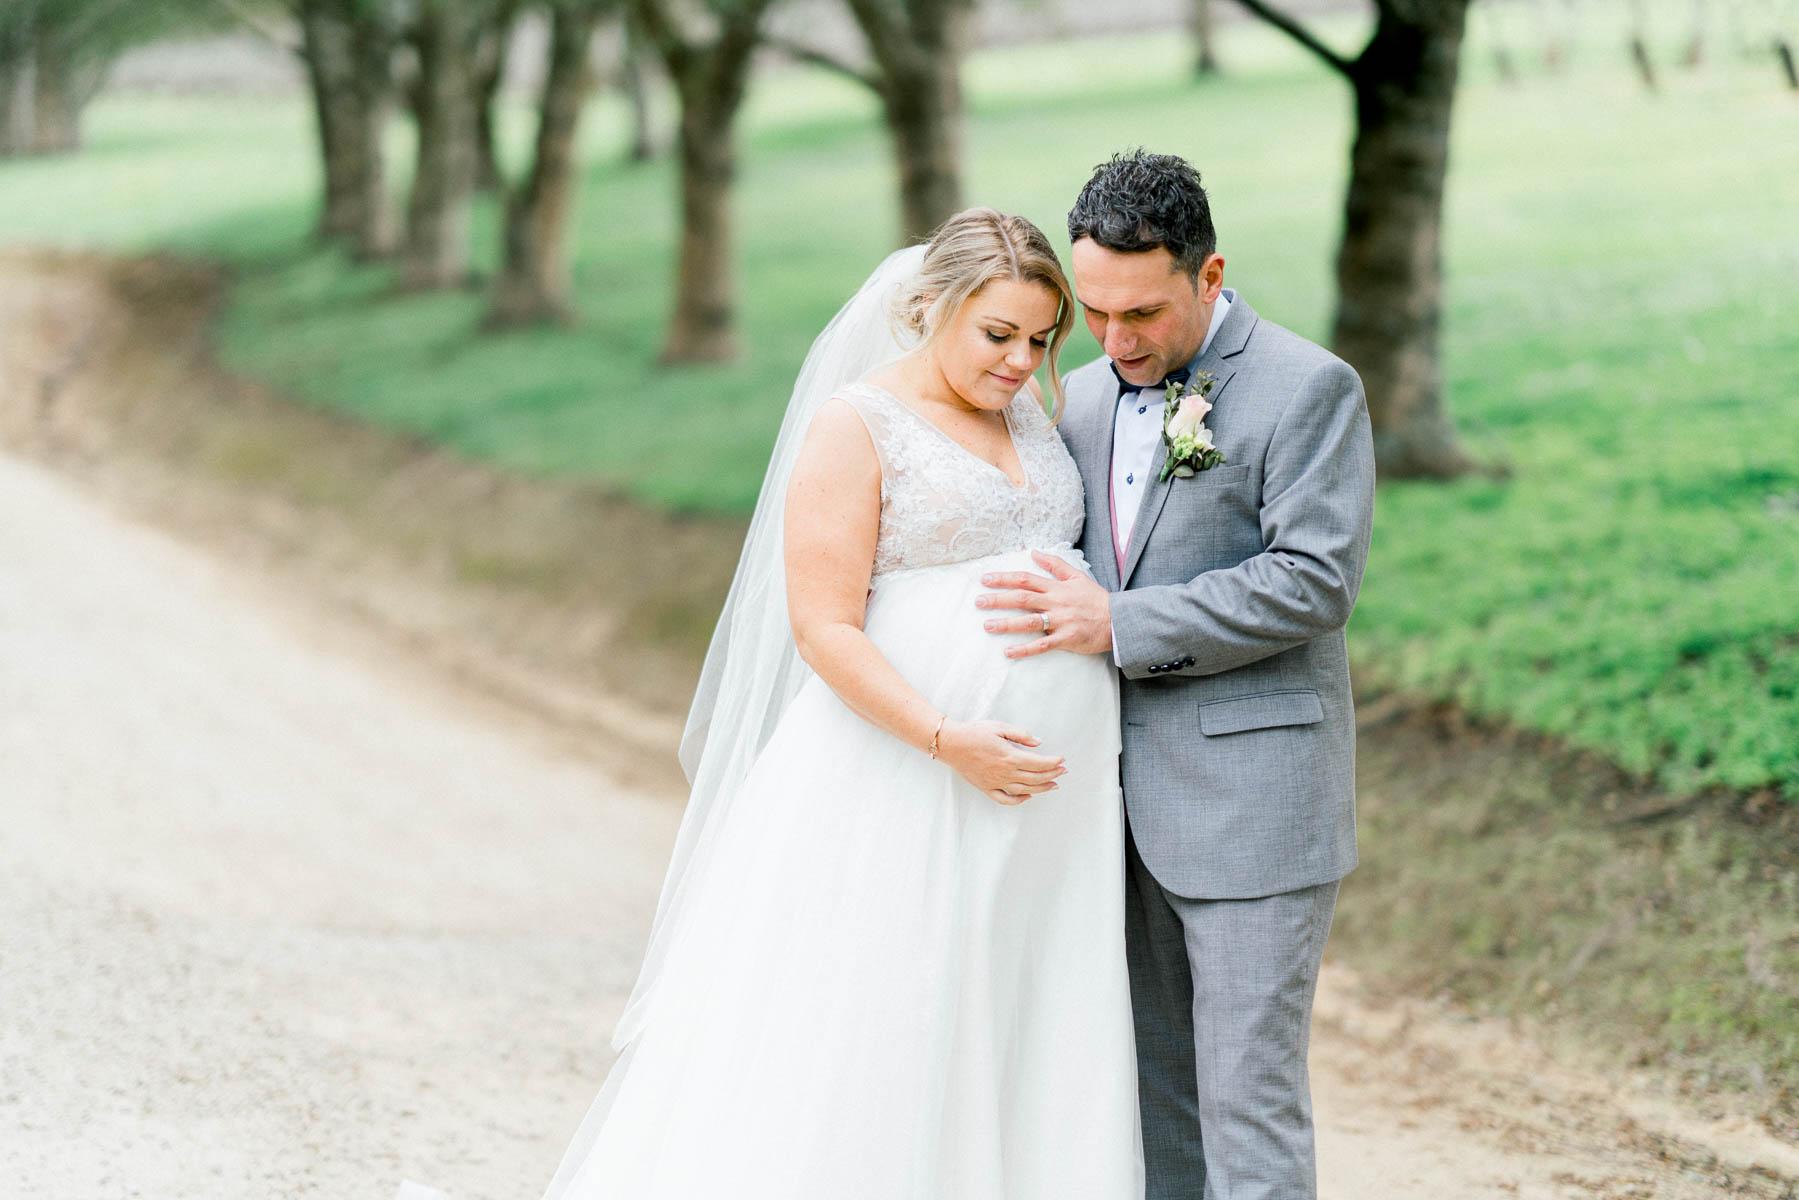 lindenderry-wedding-heart+soul-weddings-amy-alain-03746.jpg